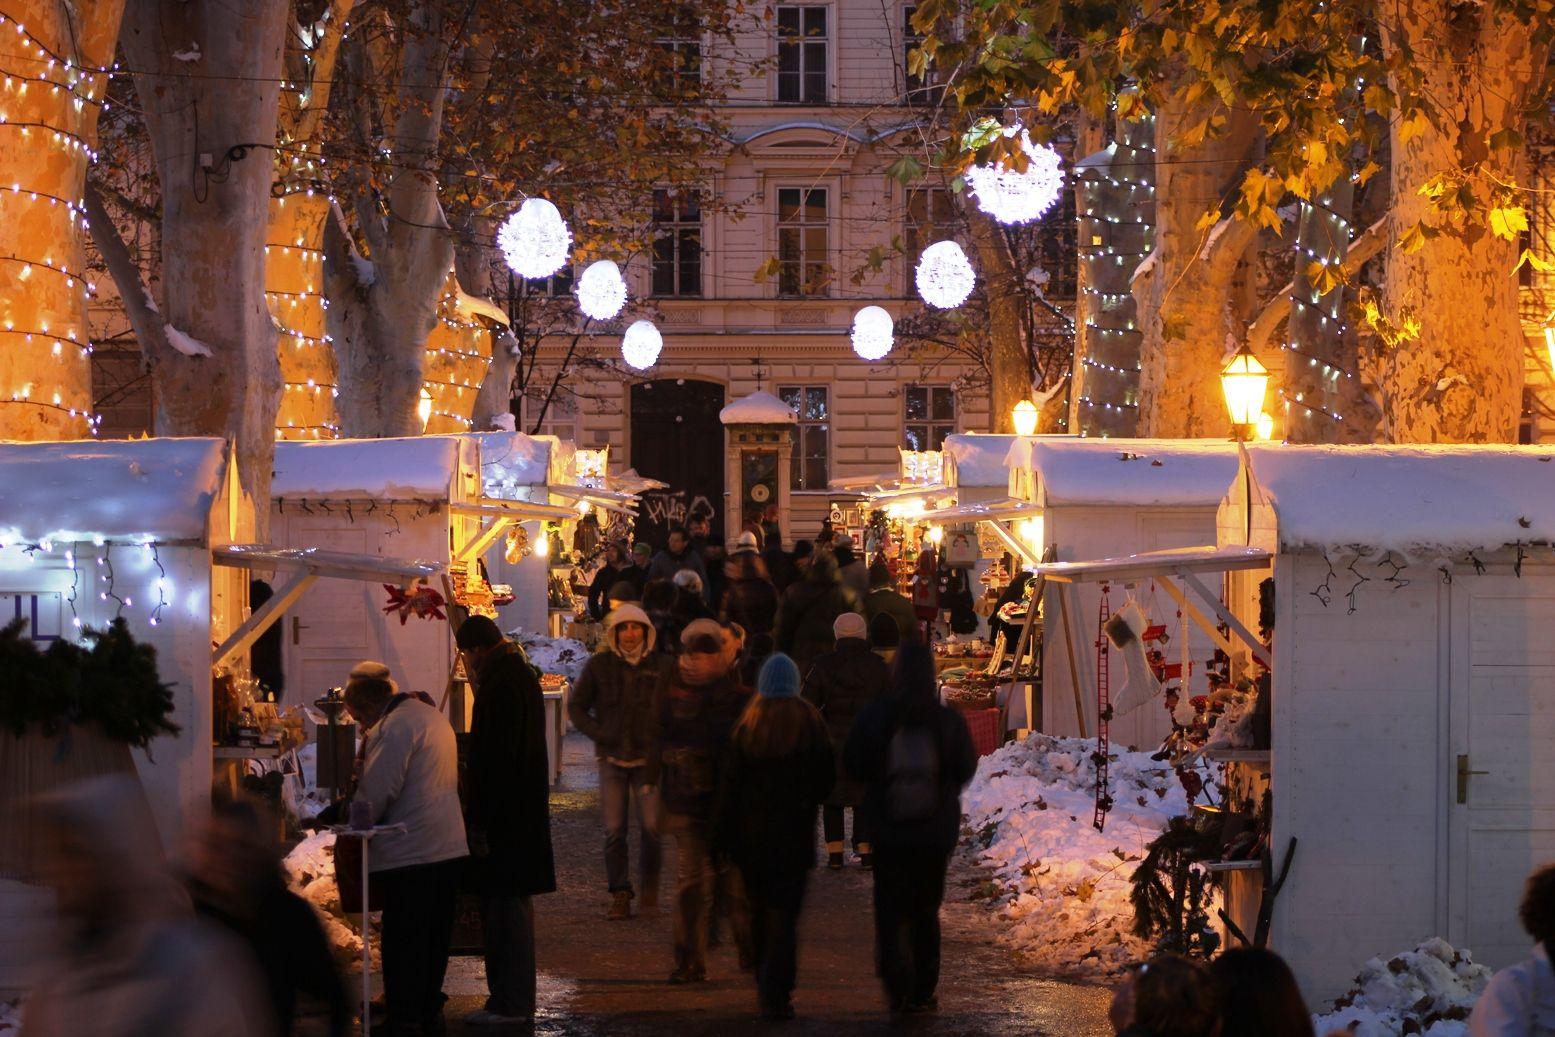 Advent Time On Zrinjevac Square In Zagreb Christmas Market Croatia Christmas